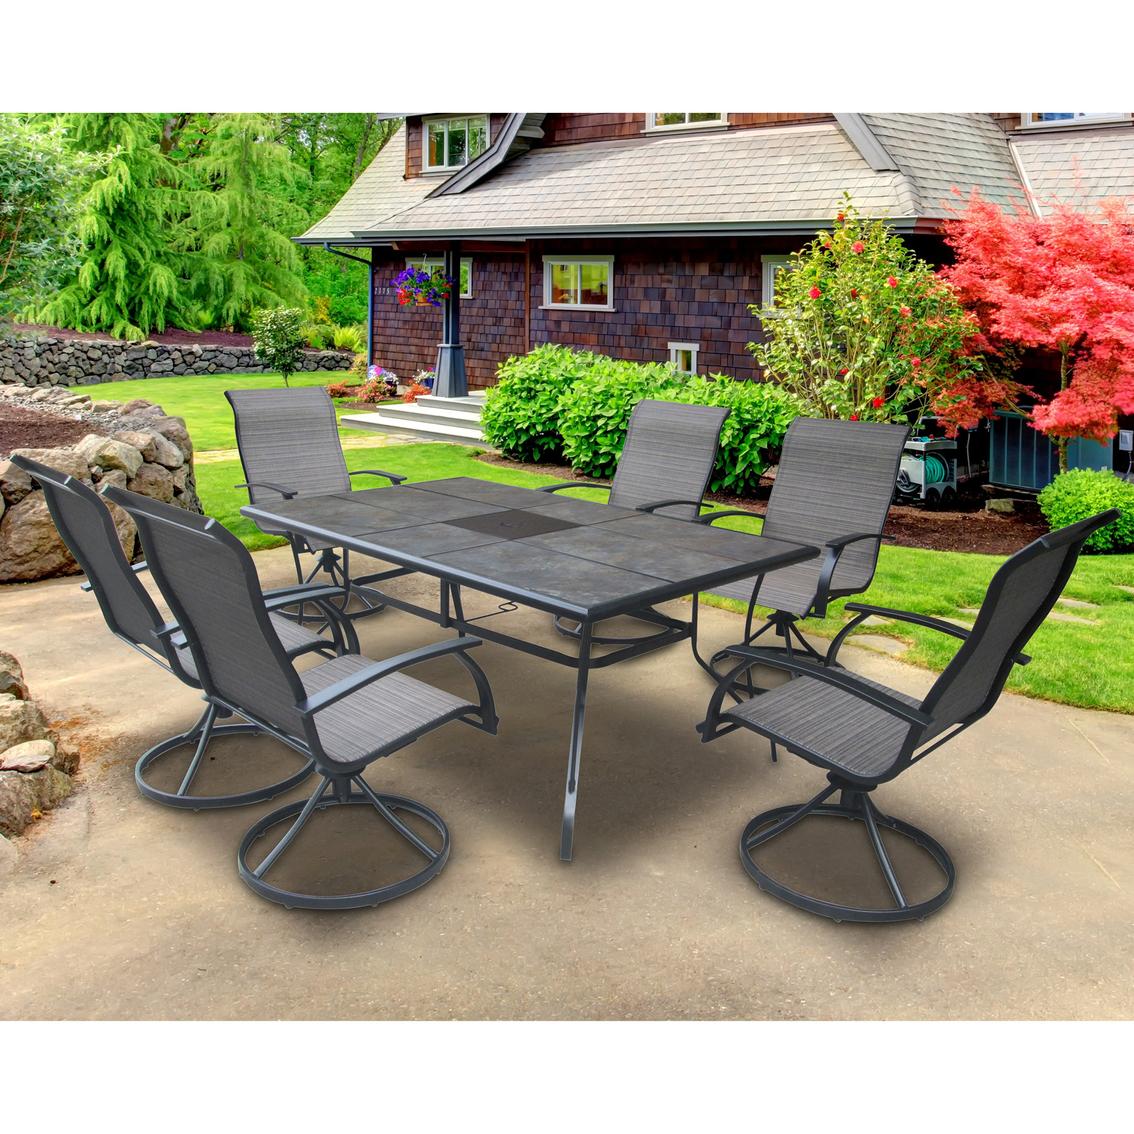 courtyard creations woodridge 7 pc outdoor dining set